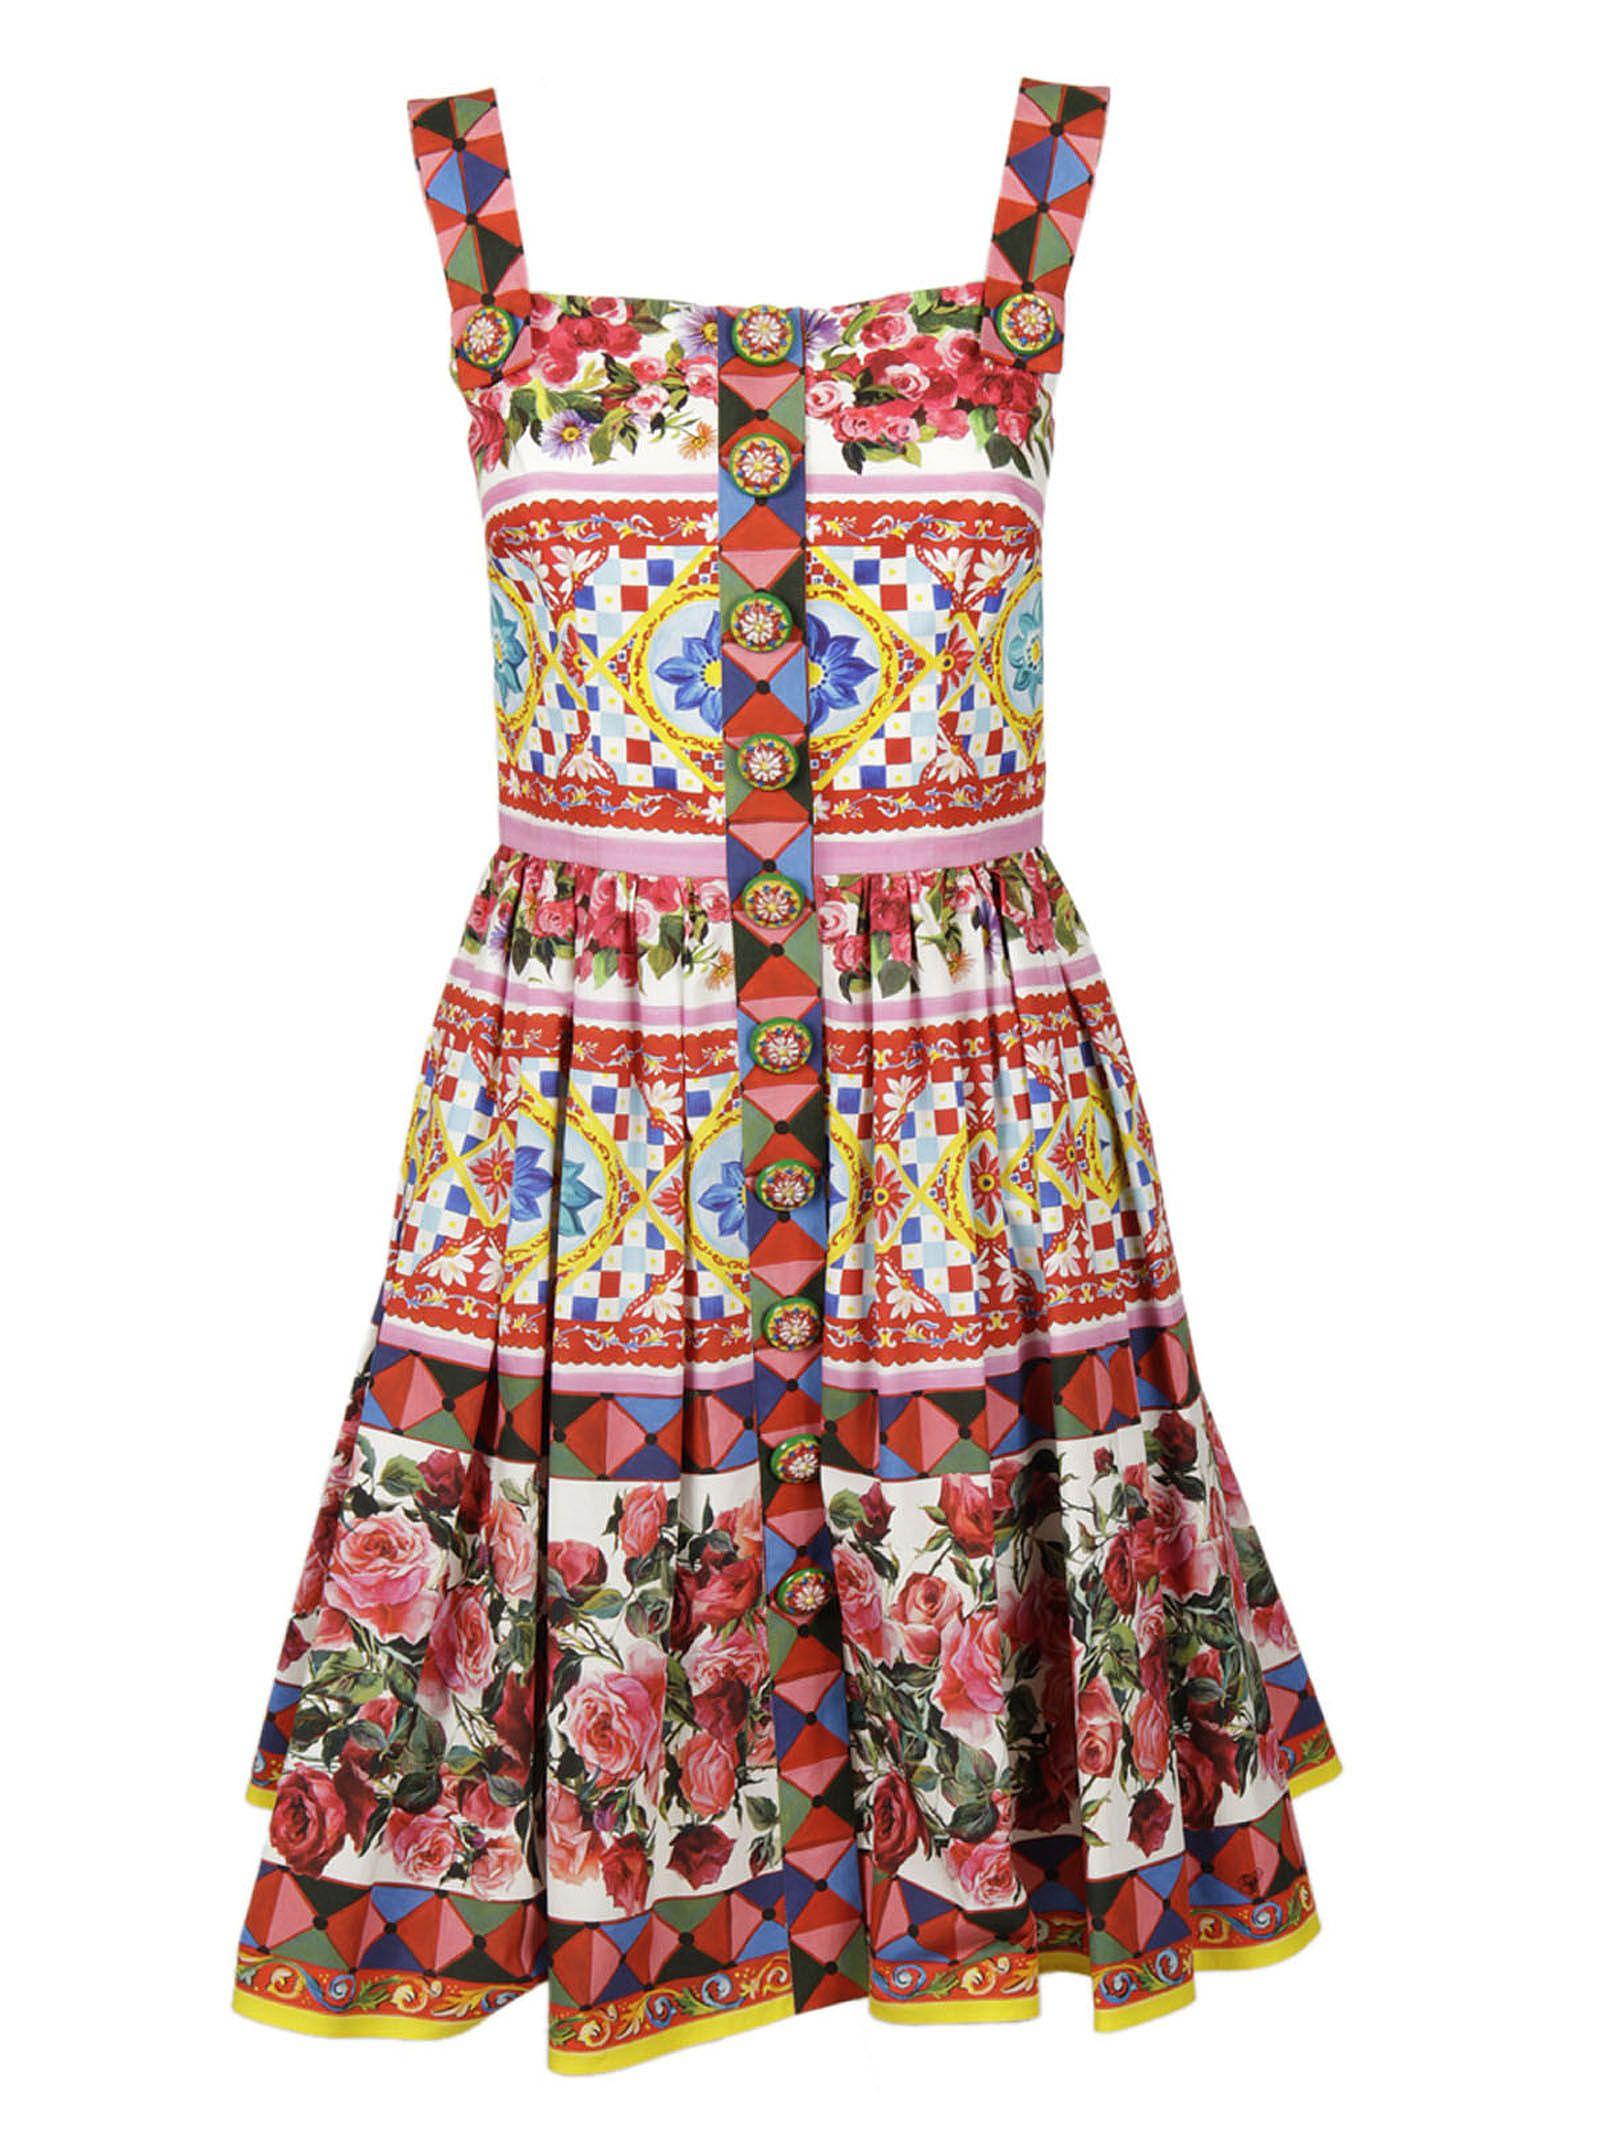 Dolce & Gabbana Majolica Rose Print Dress